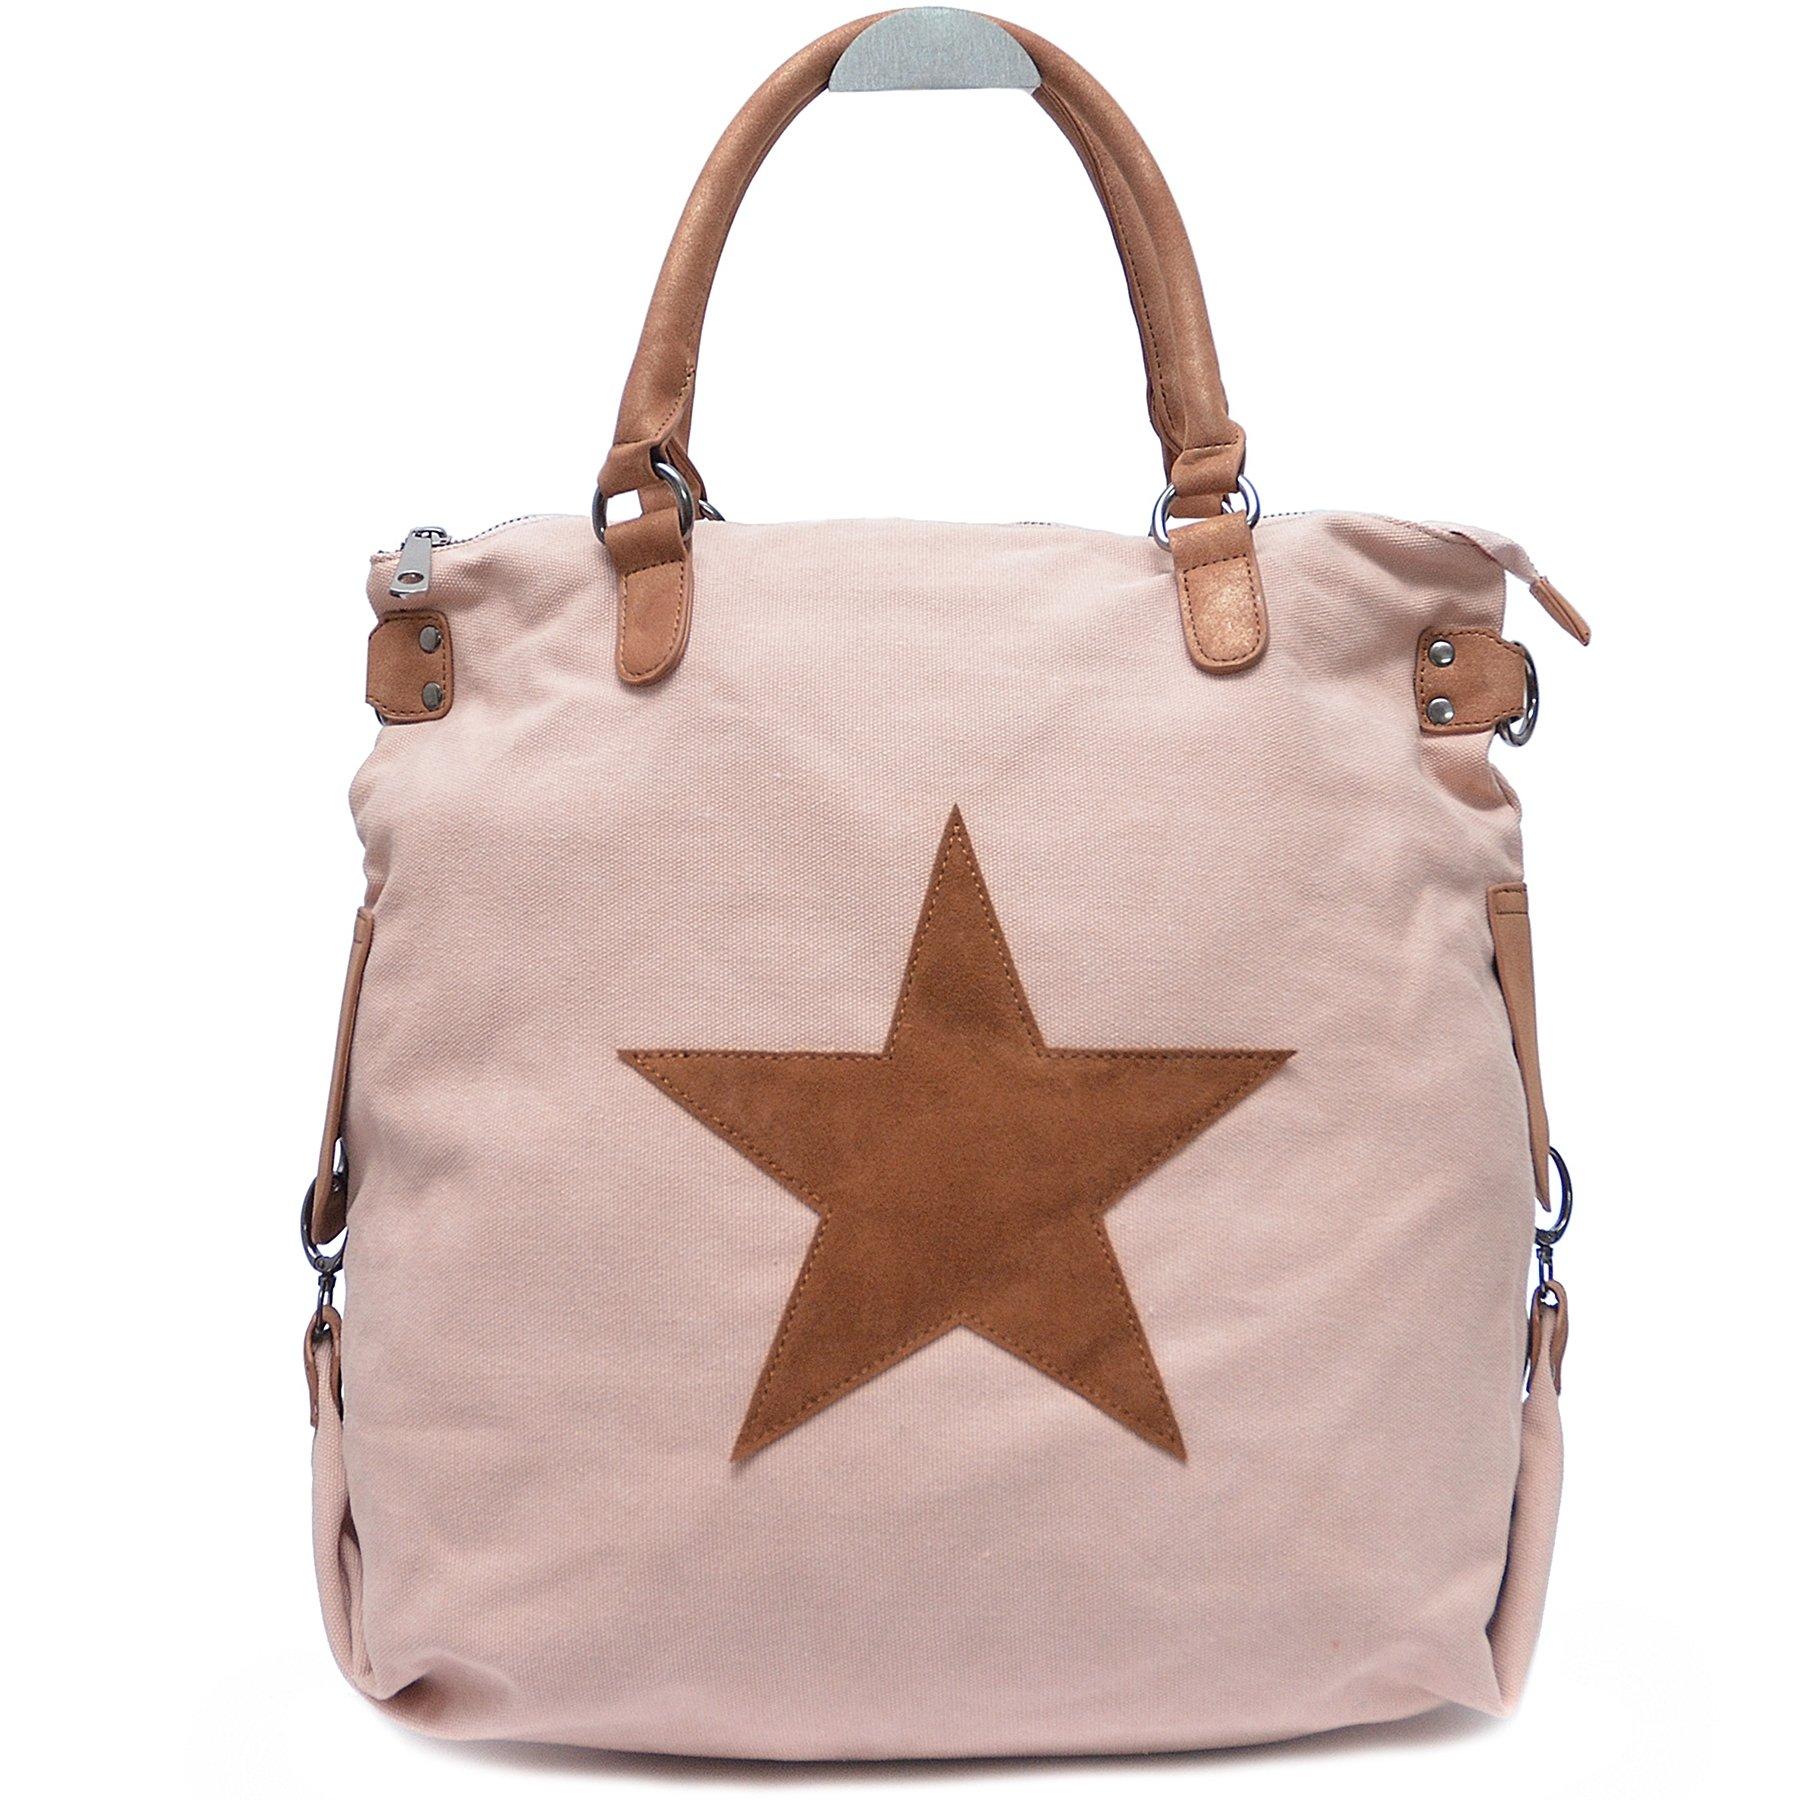 f96d60f182aa6 Vain Secrets Sternen Shopper Damen Handtasche mit Schulterriemen product  image